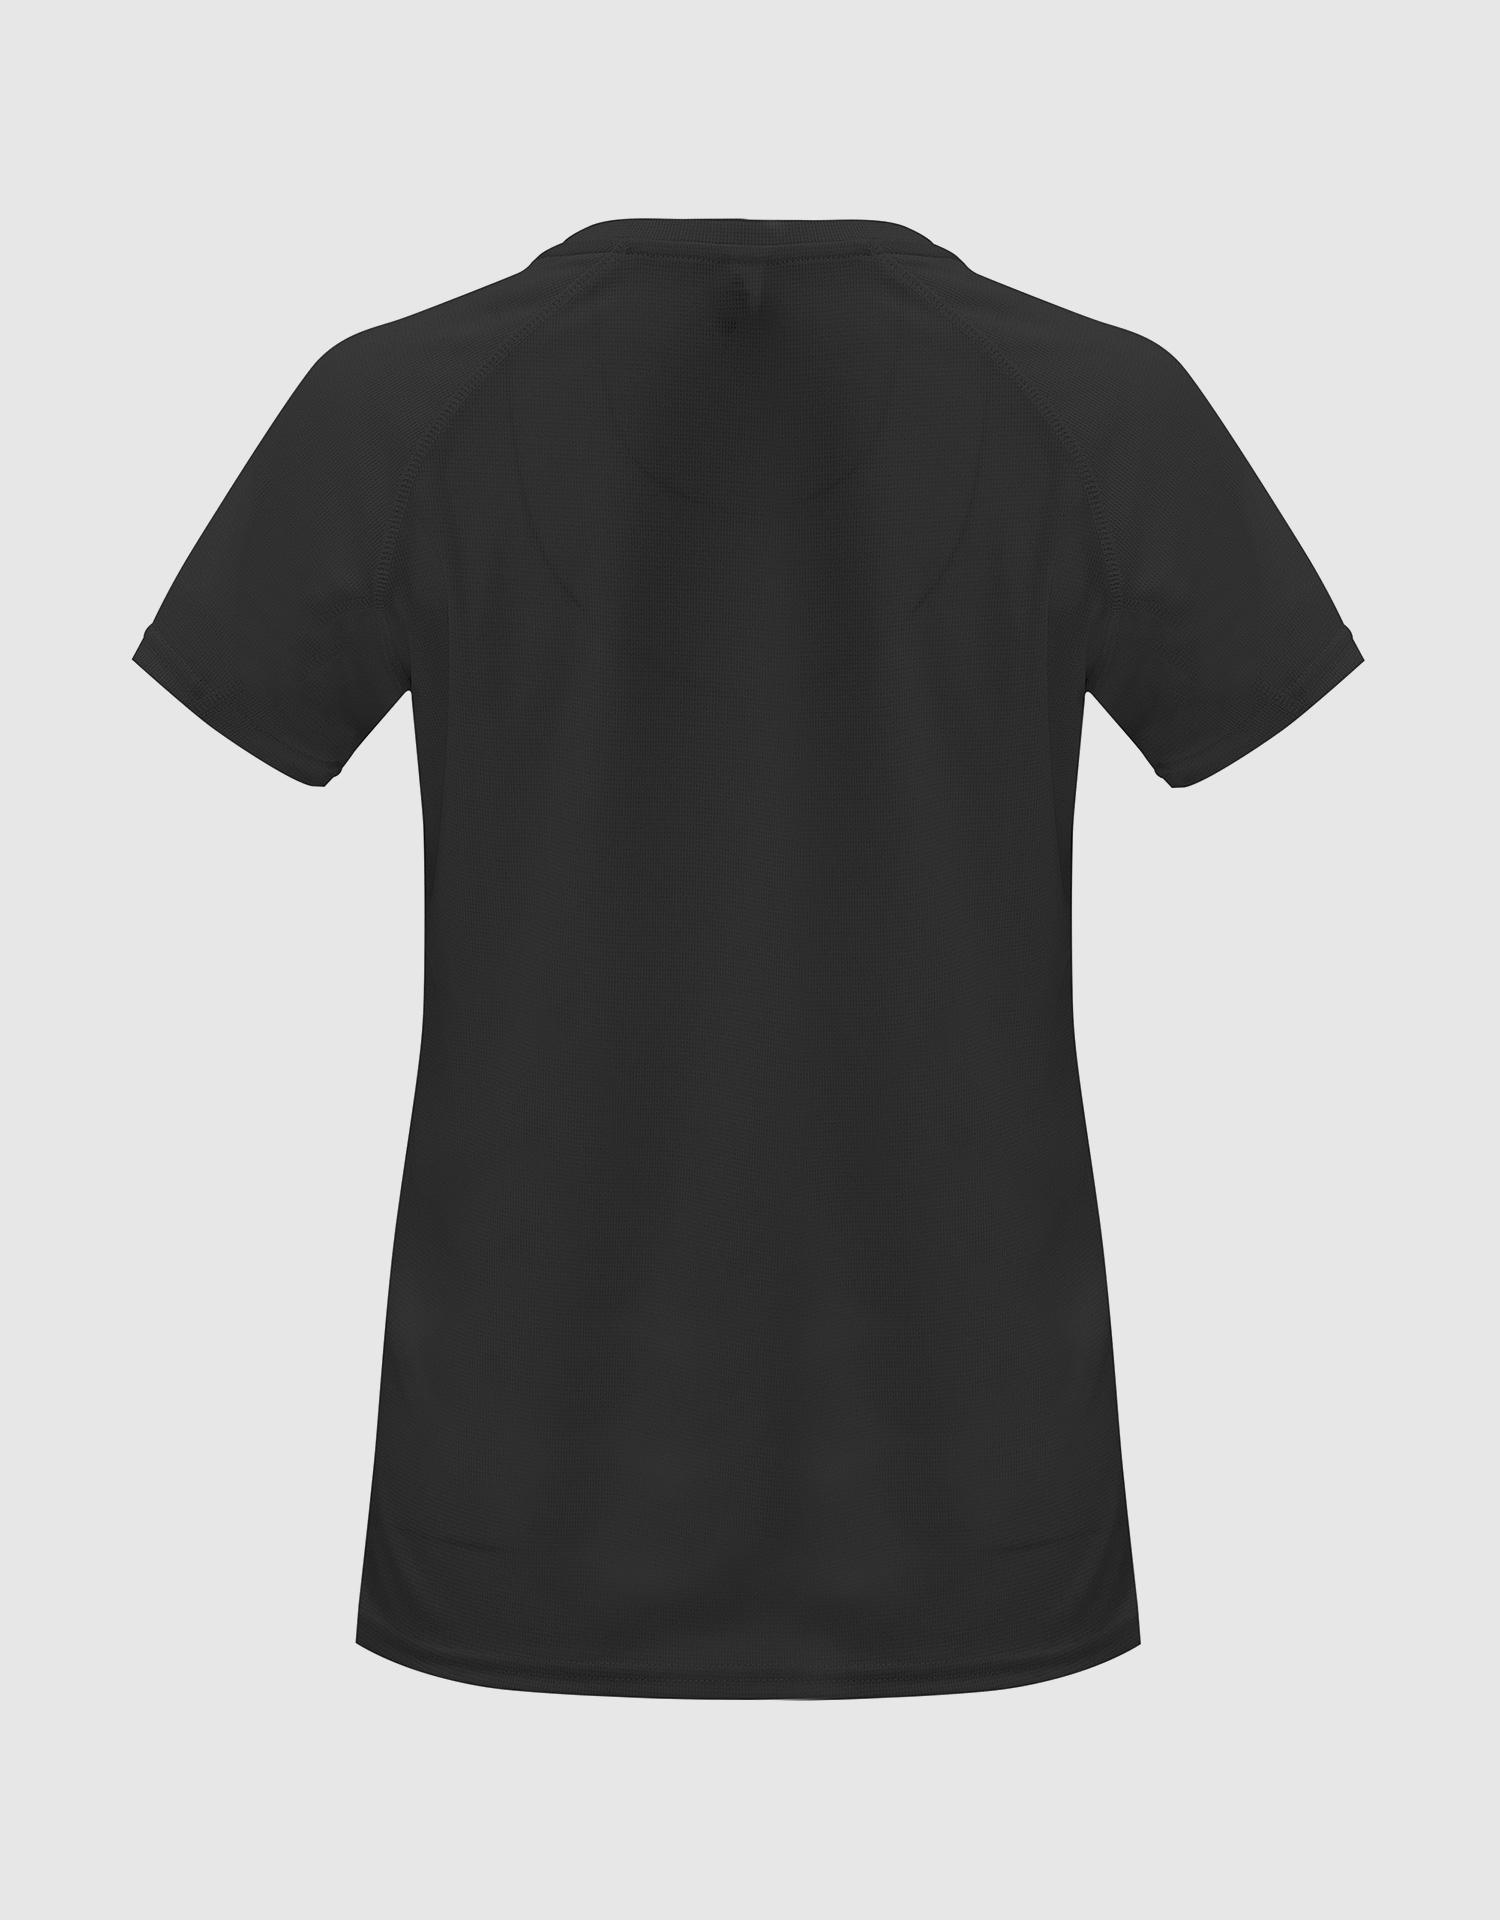 prodotto ninesquared t-shirt pipe woman